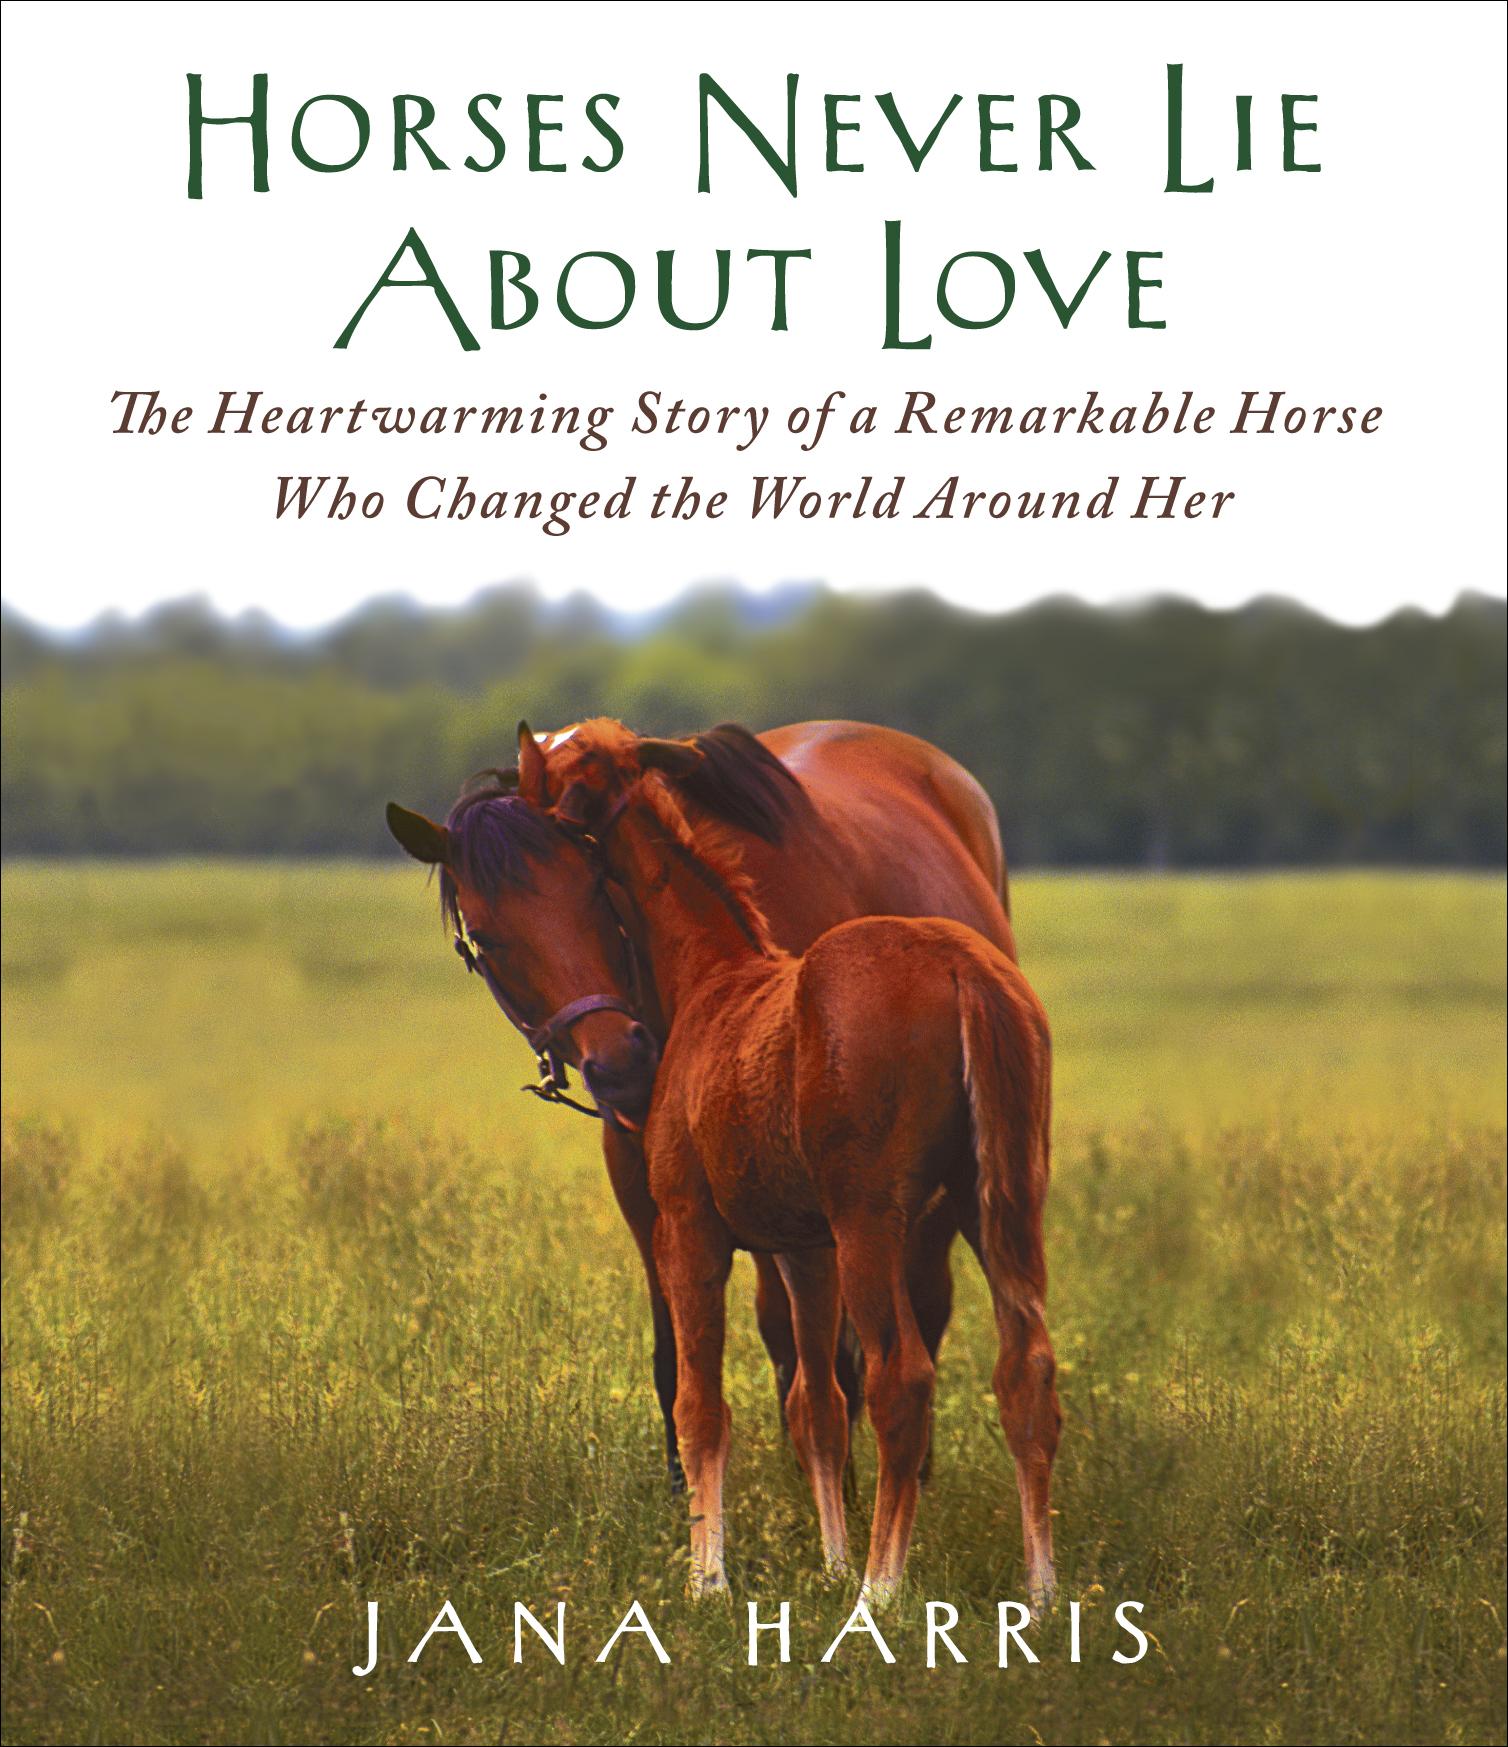 Horse Lovers Quotes. QuotesGram